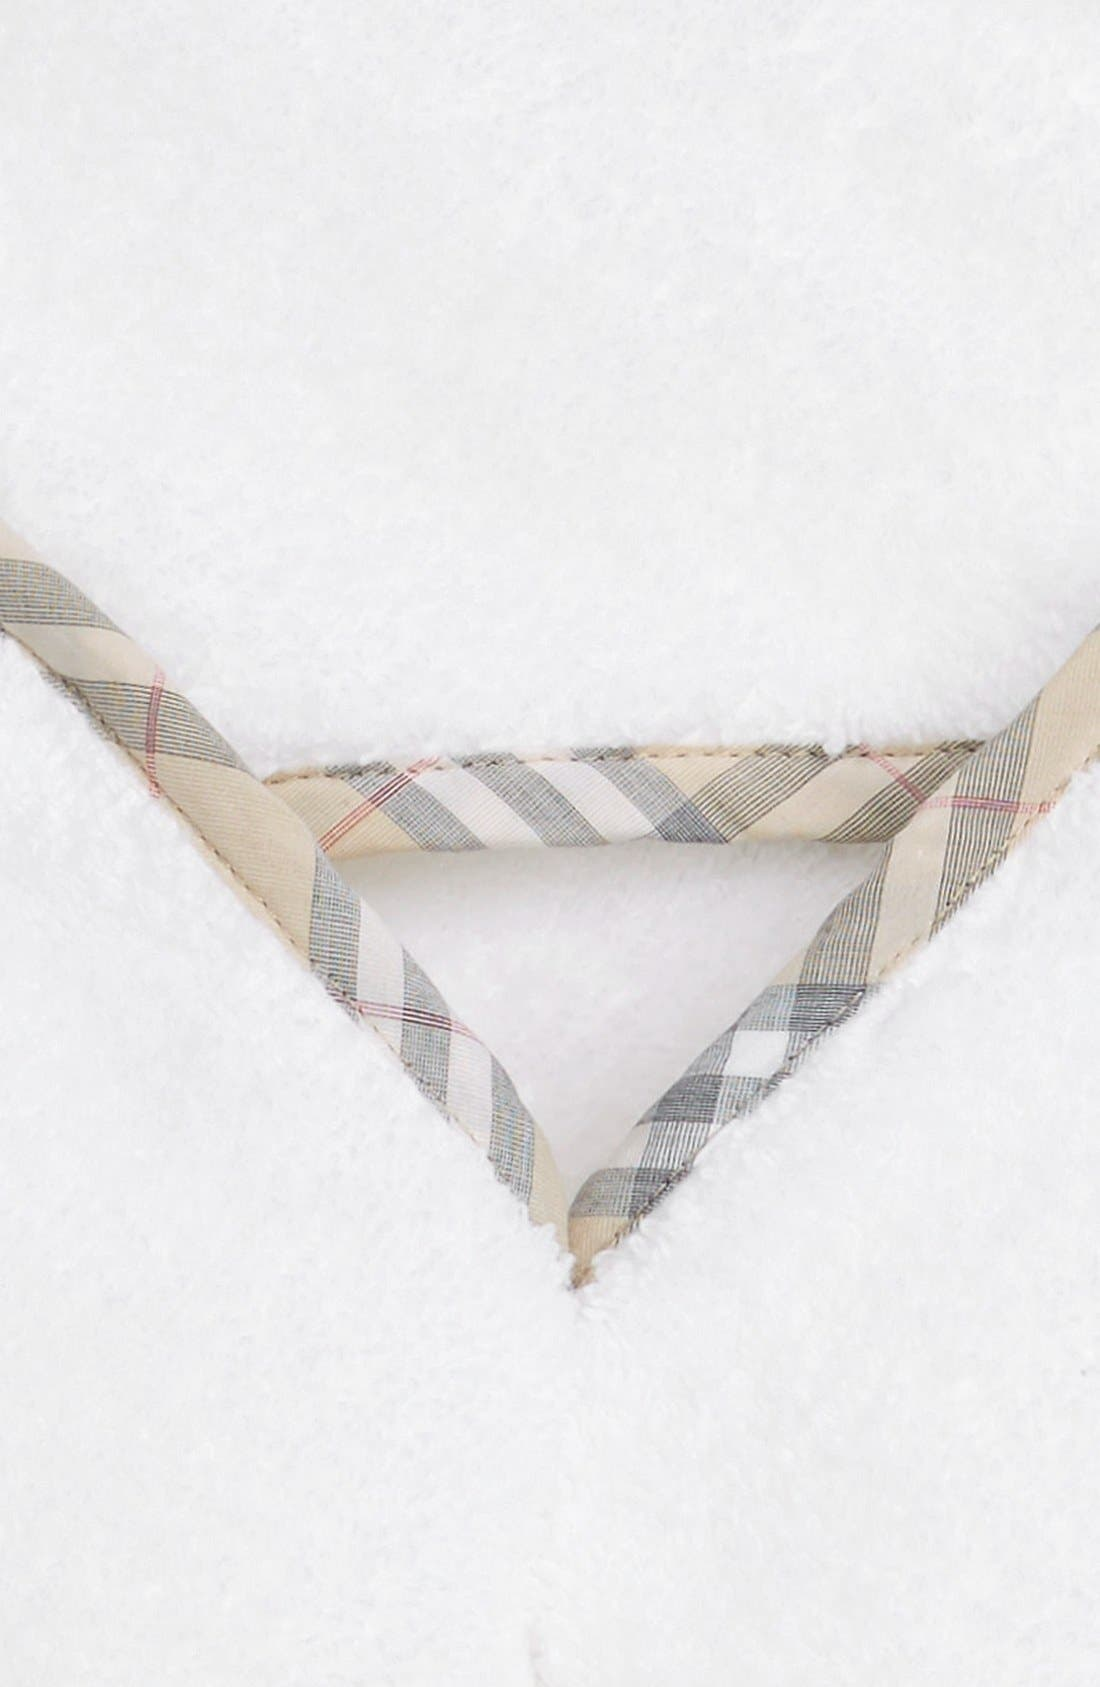 Hooded Towel & Bath Mit Gift Set,                             Alternate thumbnail 2, color,                             White